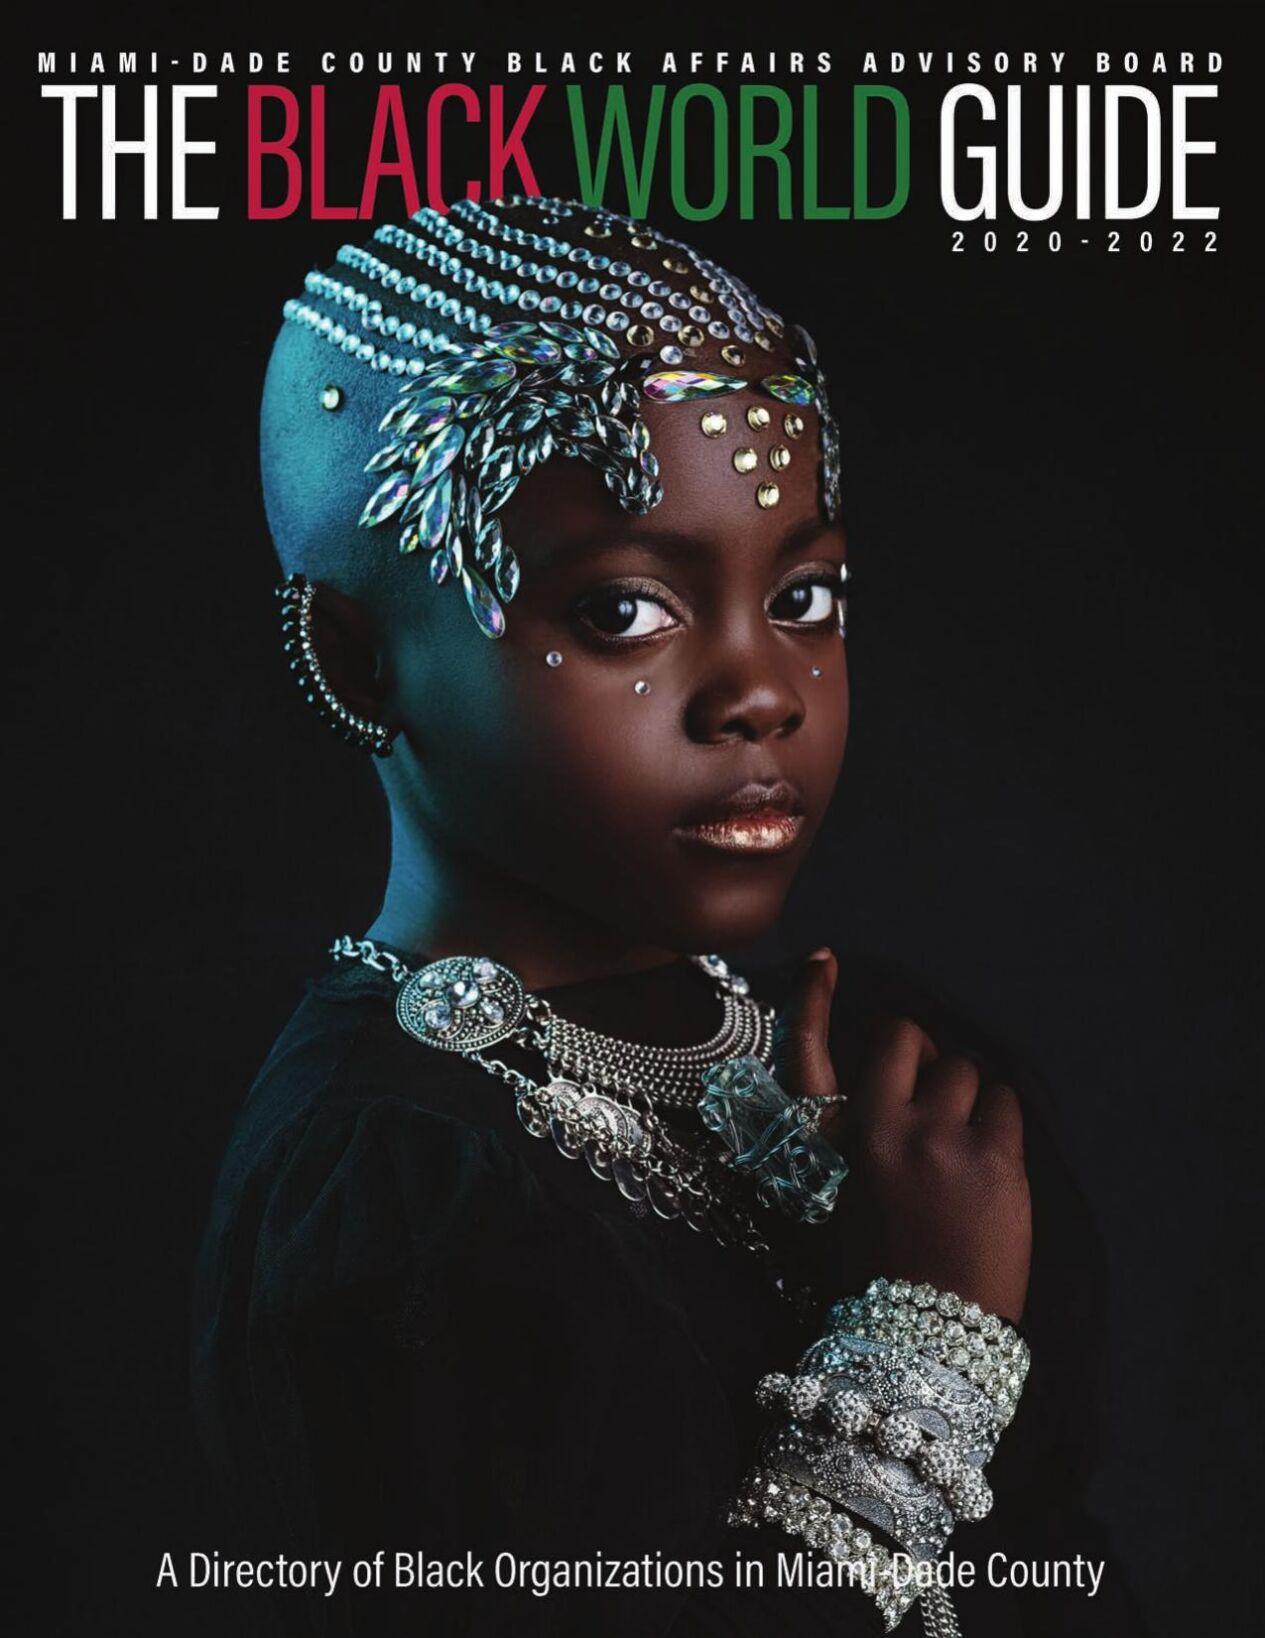 Black World Guide 2020-2022